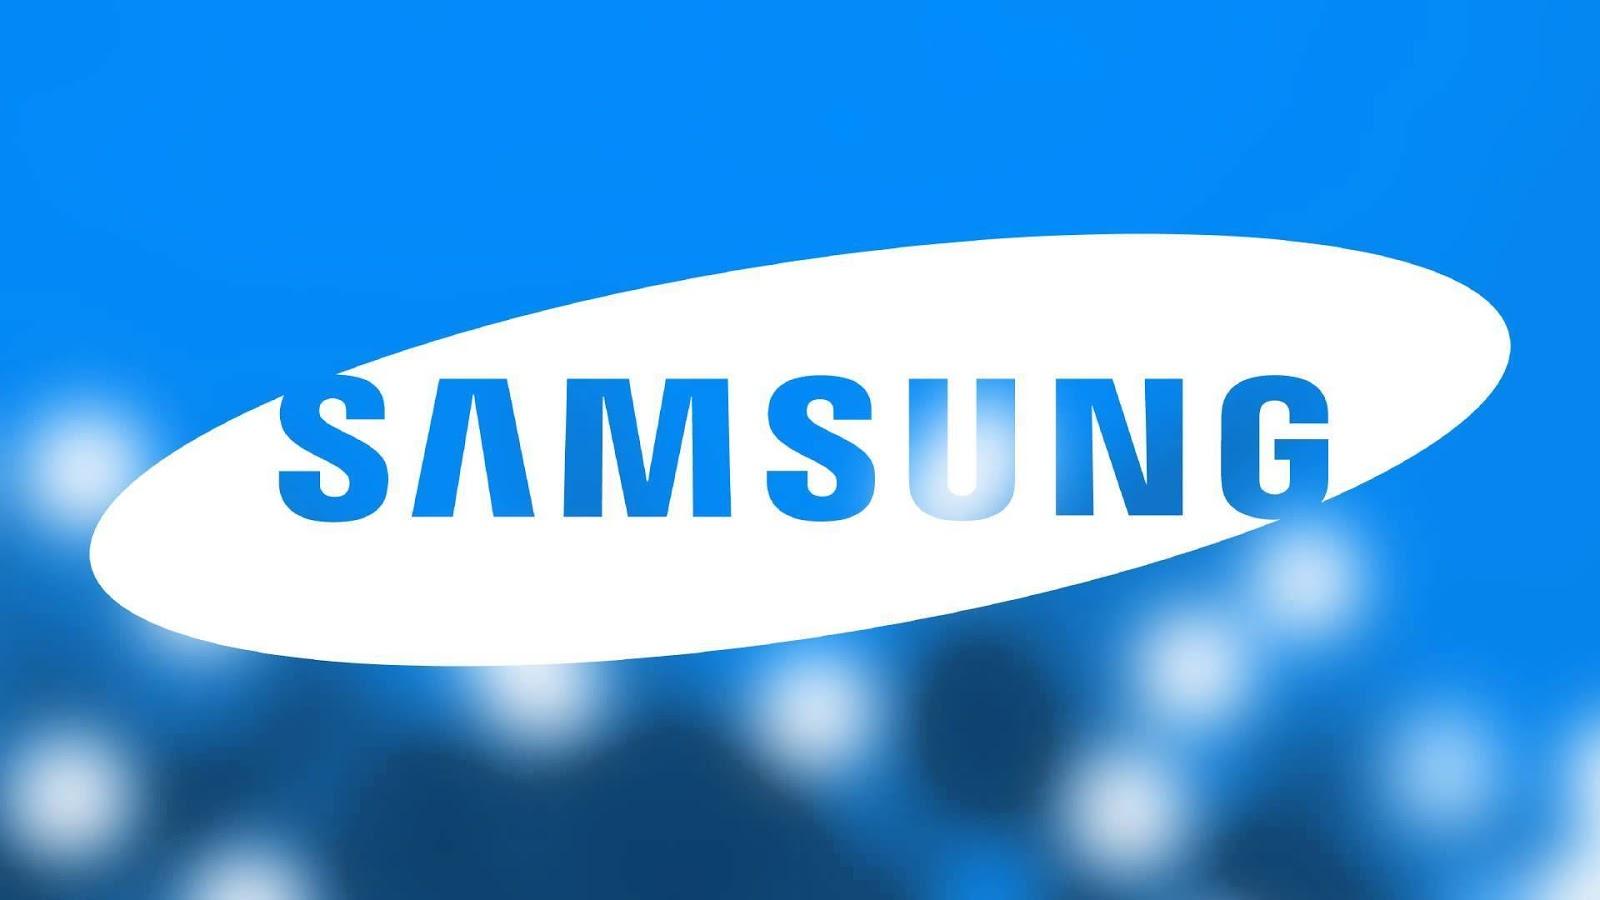 Samsung Samsung Logo Mobile Wallpaper Samsung Phone Samsung Led Logo Hd 471141 Hd Wallpaper Backgrounds Download